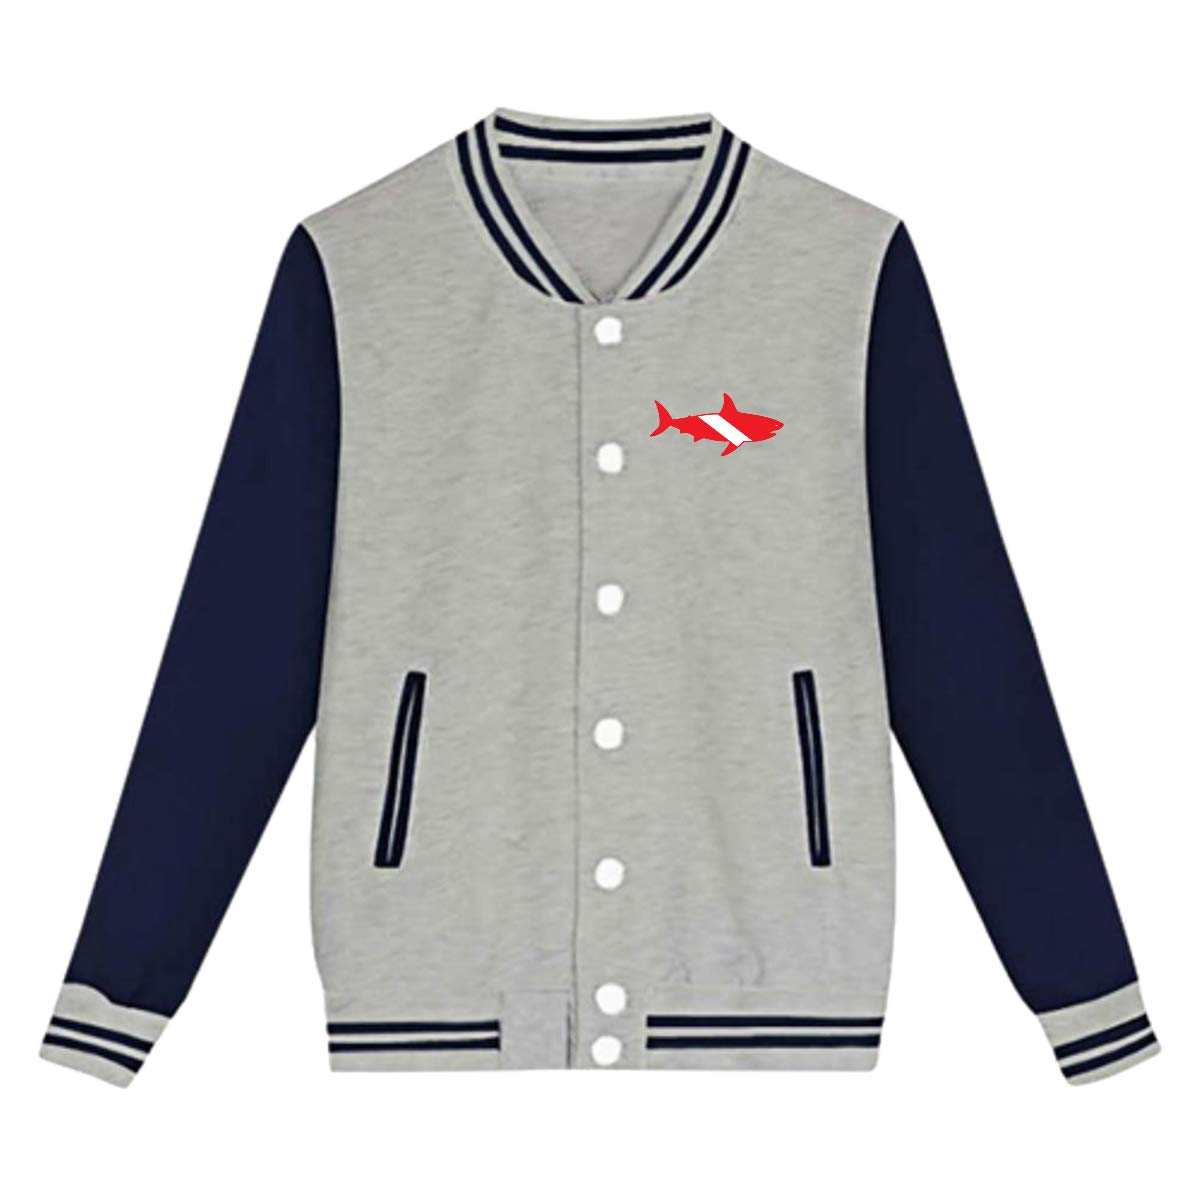 Tina TN Great White Shark Diving Teens Boys Girl Varsity Baseball Jacket Long Sleeve Sport Baseball Uniform Jacket Coat Sweater Black